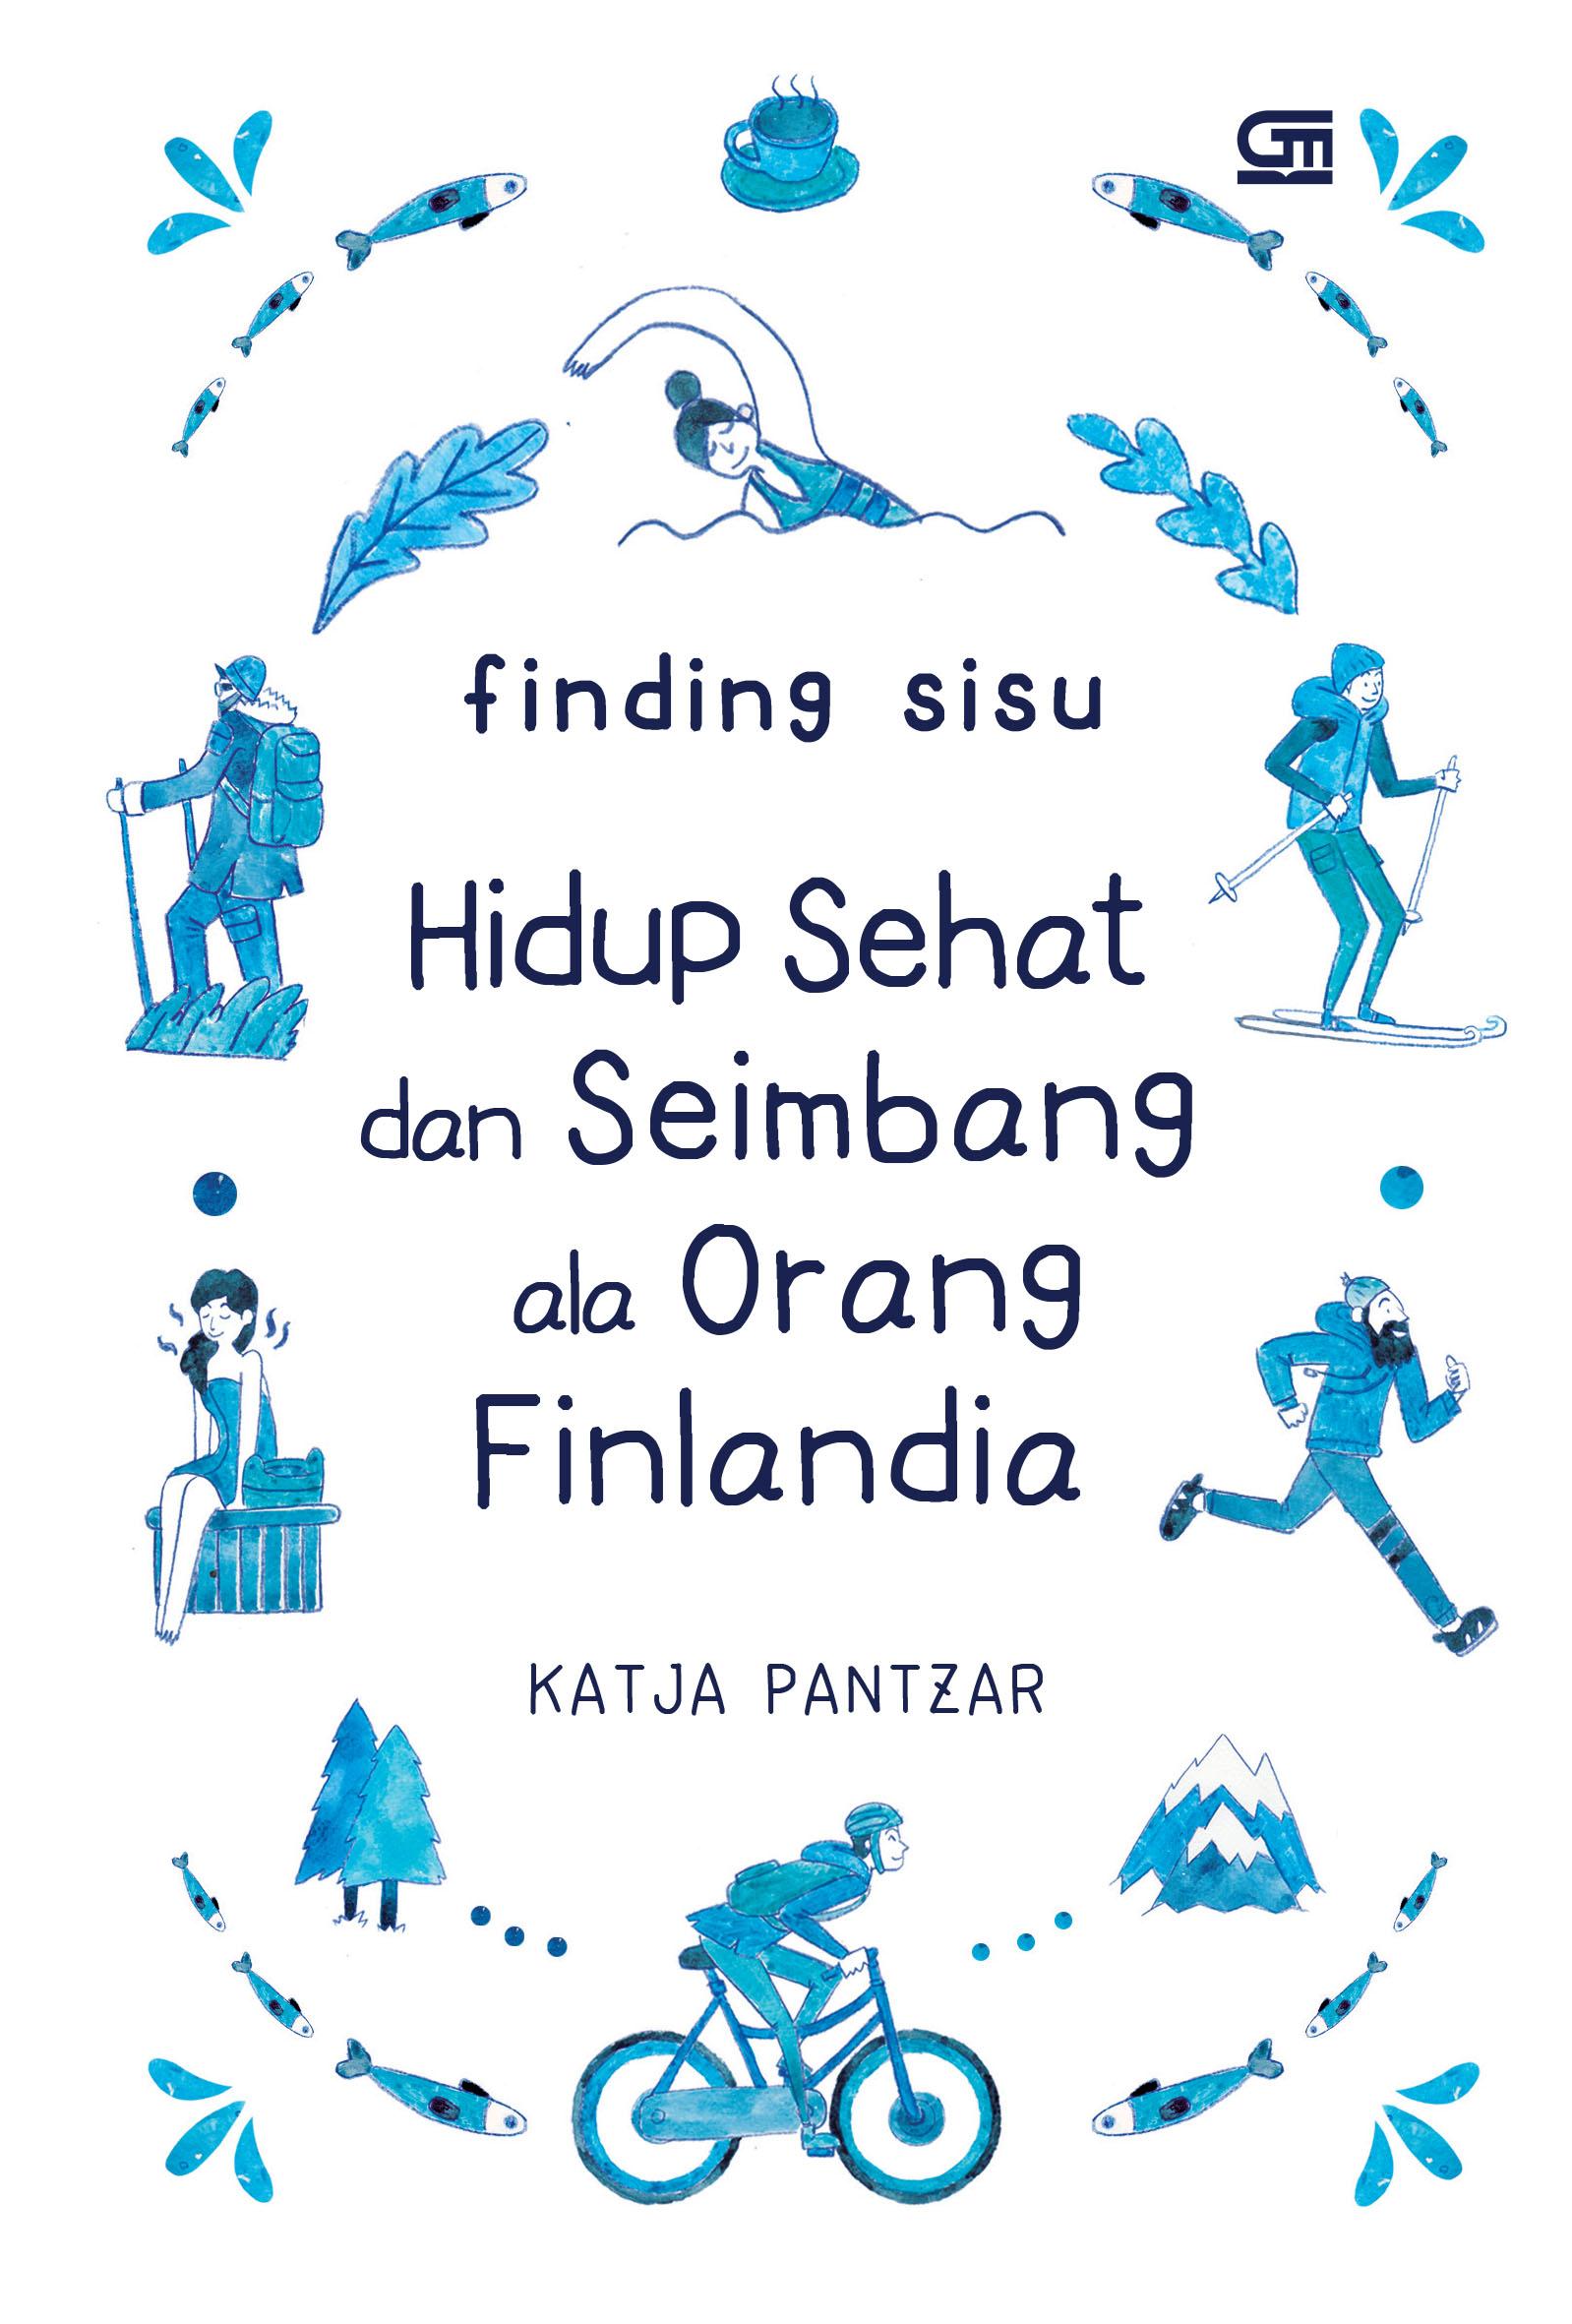 Finding Sisu: Hidup Sehat dan Seimbang Ala Orang Finlandia